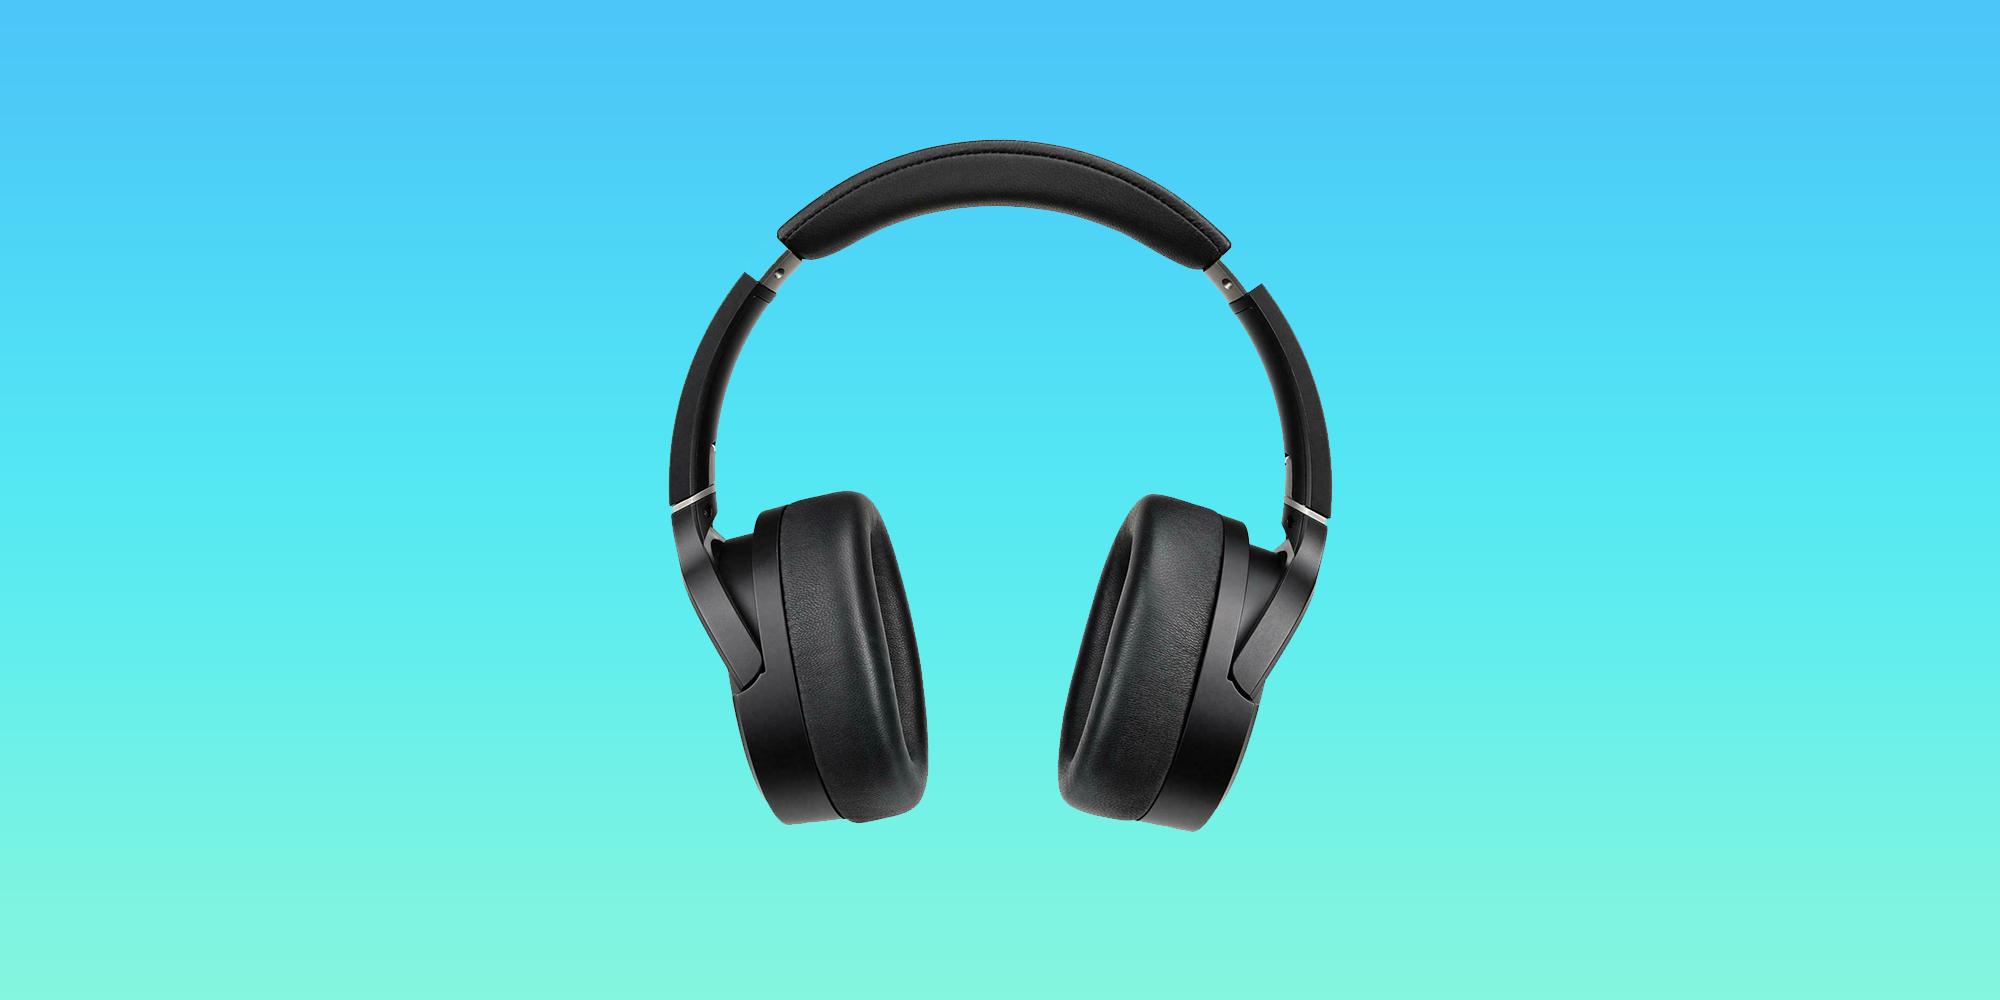 The best mid-range headphones